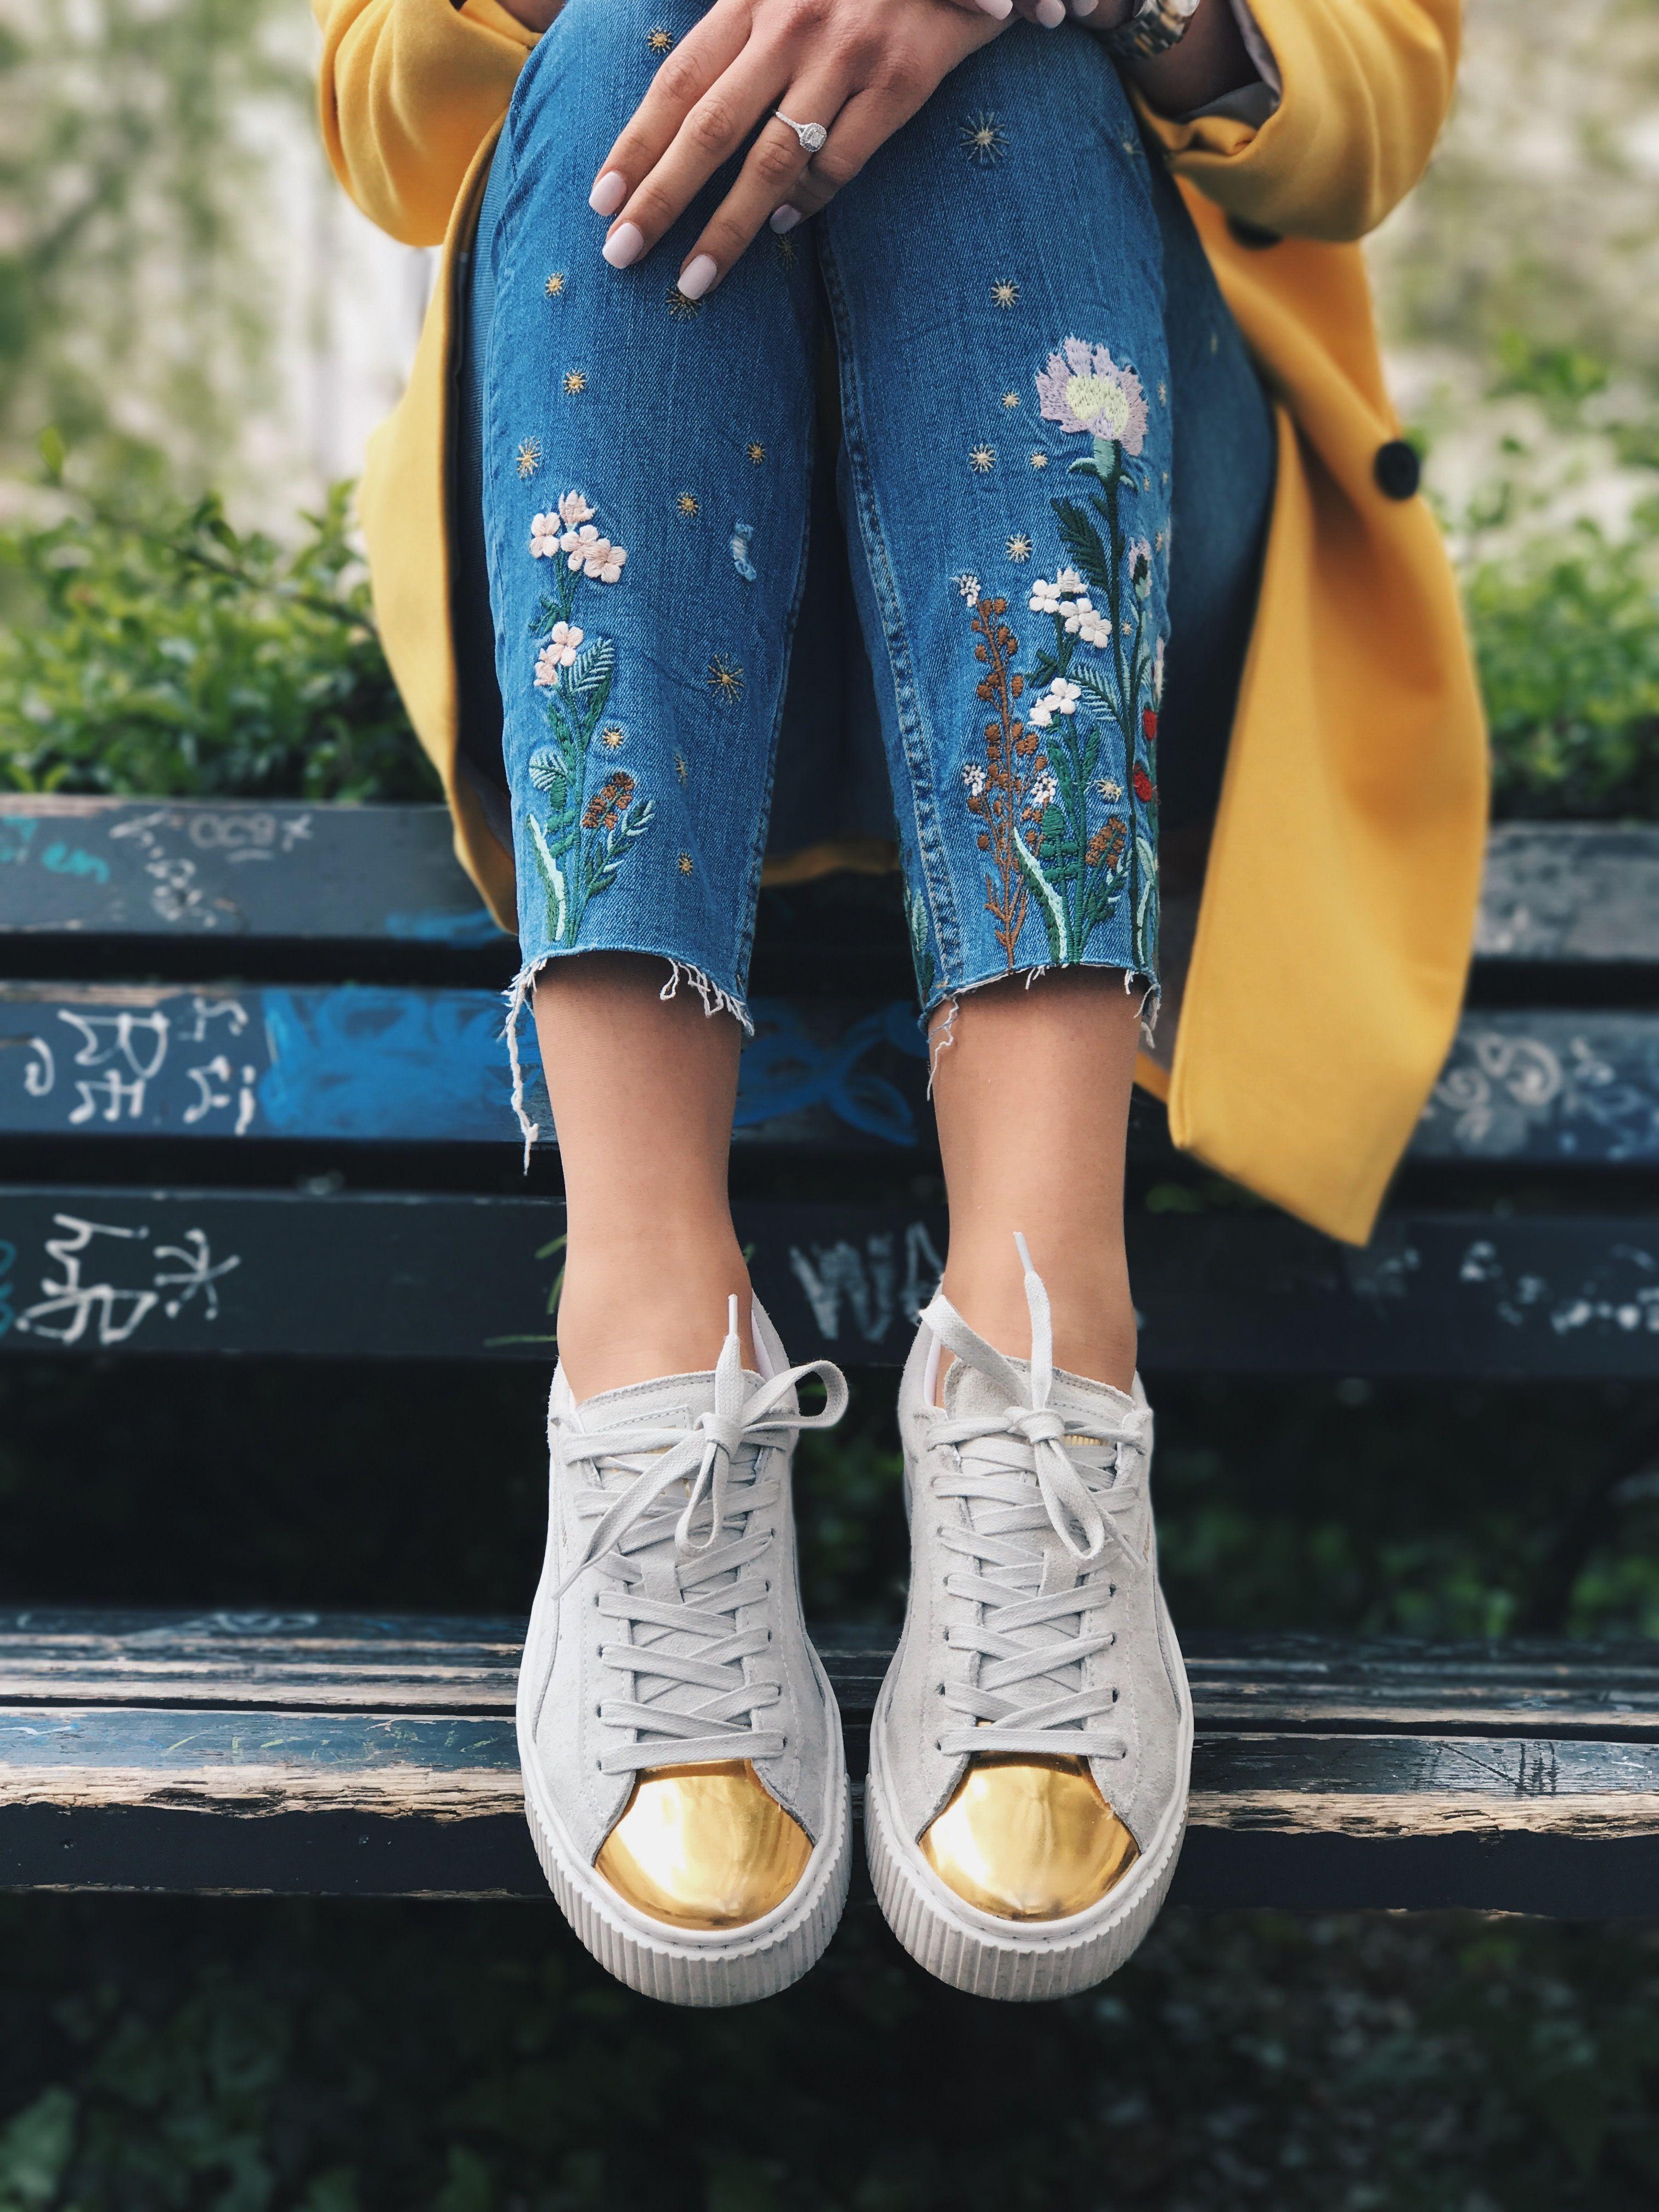 sommertrends 2017 bestickte jeans mit puma sneaker mode pinterest bestickte jeans puma. Black Bedroom Furniture Sets. Home Design Ideas